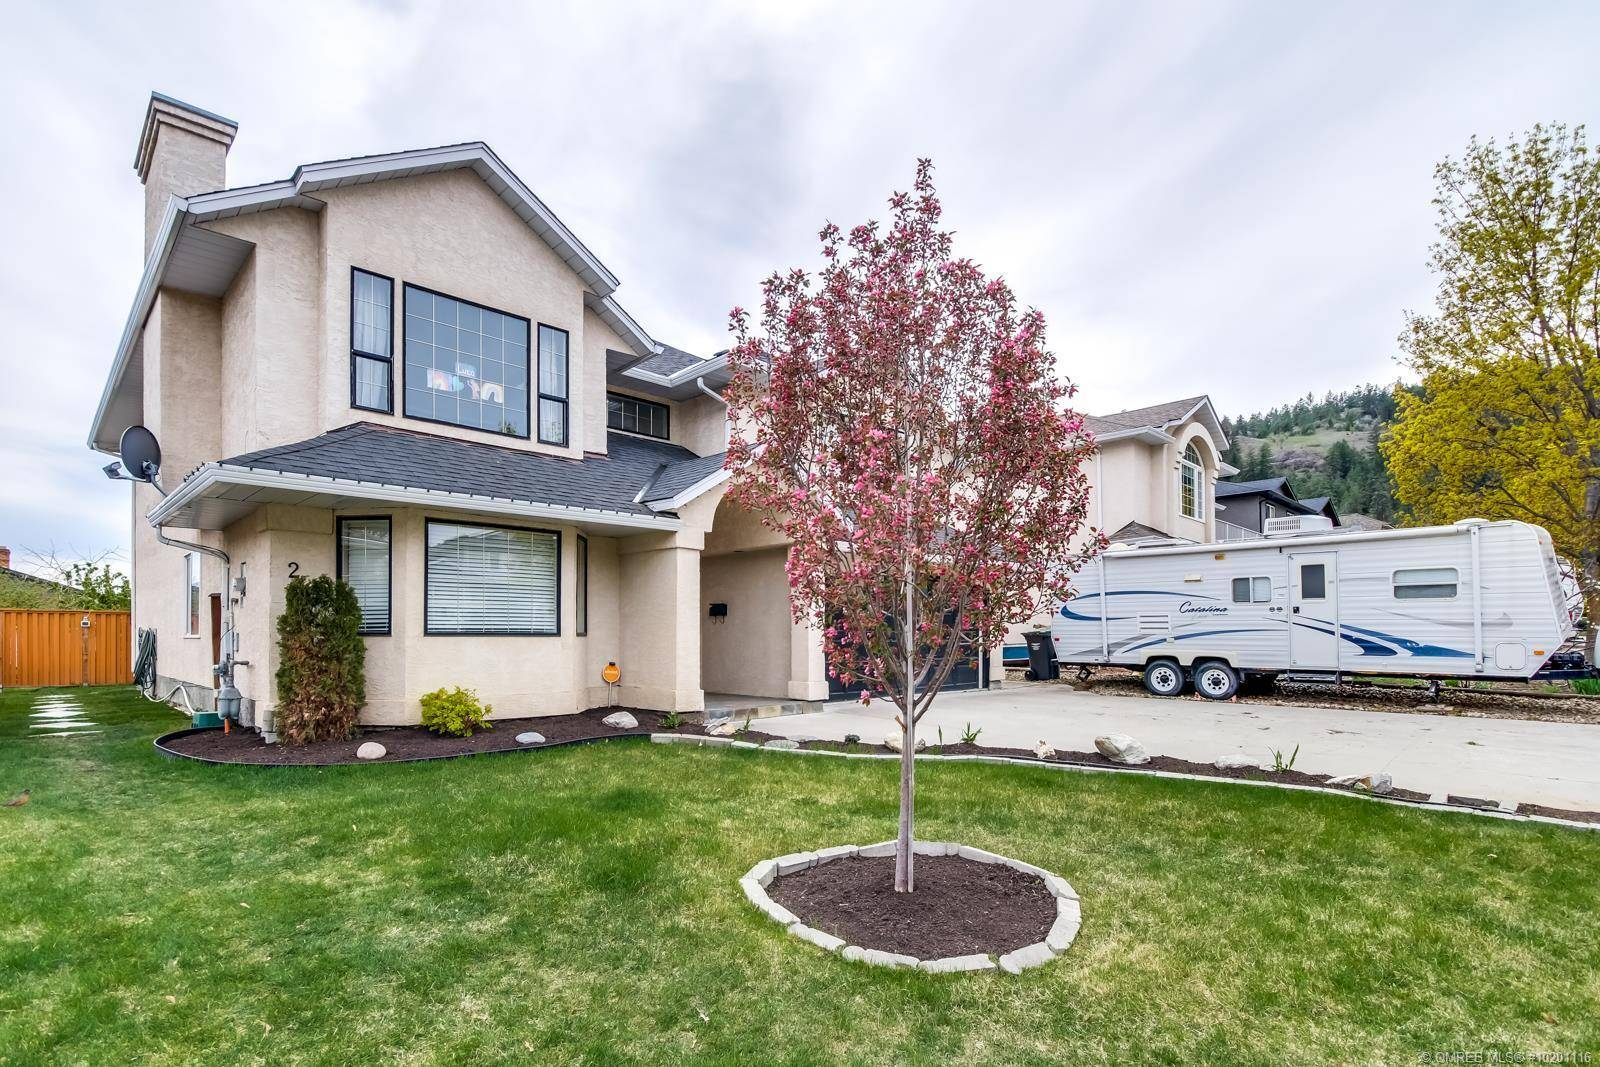 House for sale at 1893 Glenhaven Cres Kelowna British Columbia - MLS: 10201116